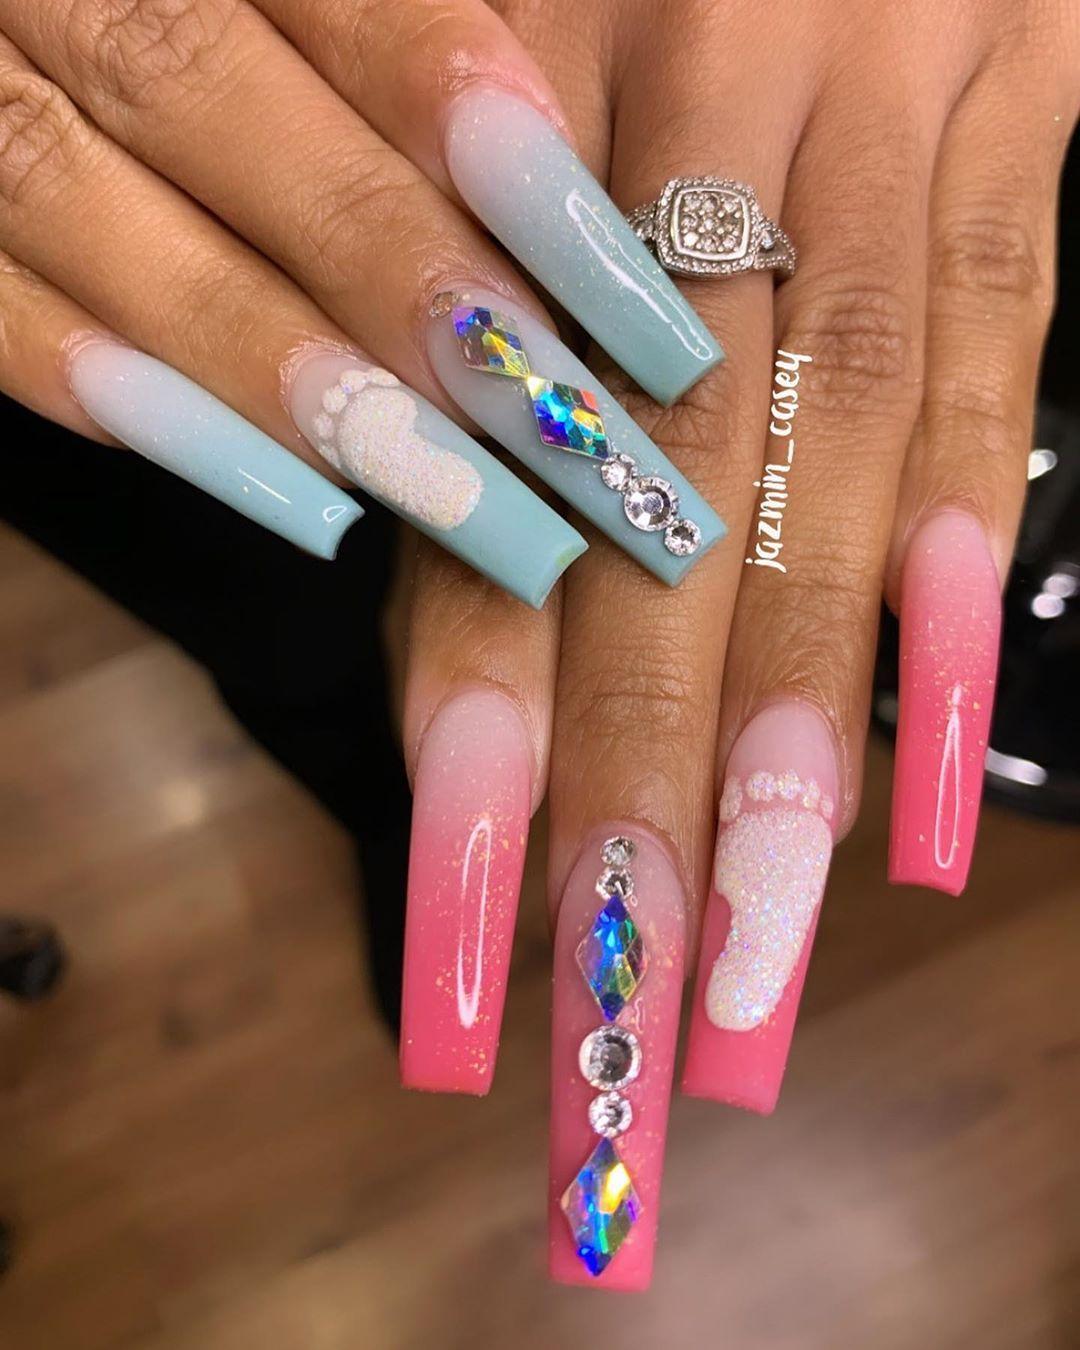 Jazmin Nail Bo On Instagram Oh Baby Gender Reveal Nails For My Good Sis Ebonecamille In 2020 Gender Reveal Nails Bling Acrylic Nails Neon Acrylic Nails